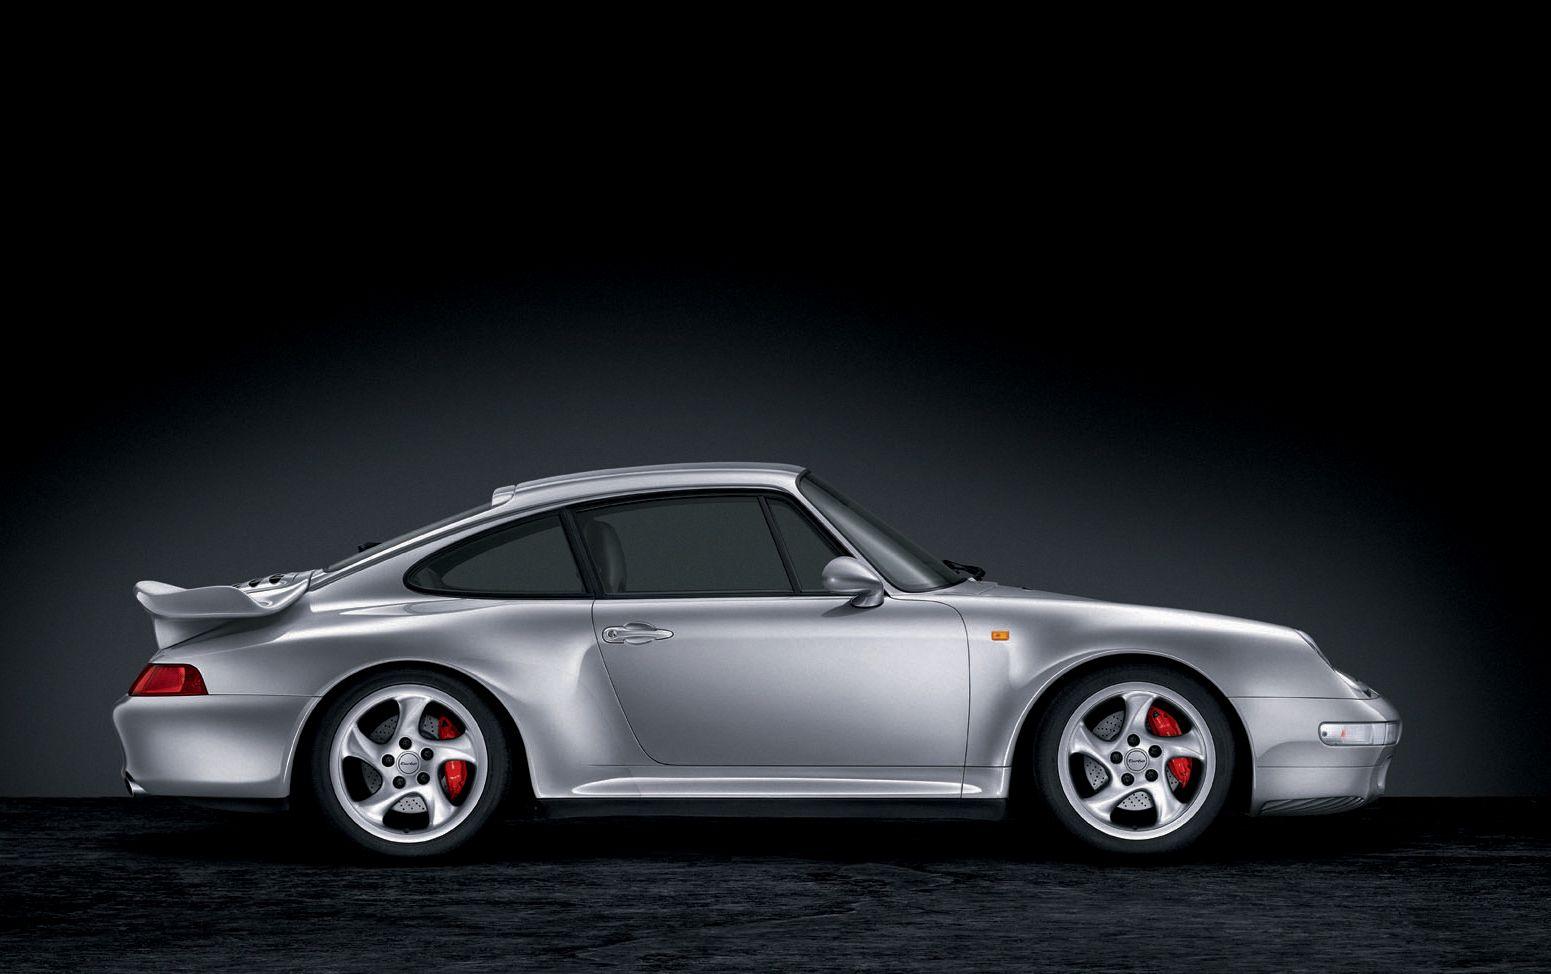 1995 Porsche 911 Turbo 993 Porsche 911 Turbo Porsche 911 Classic Porsche